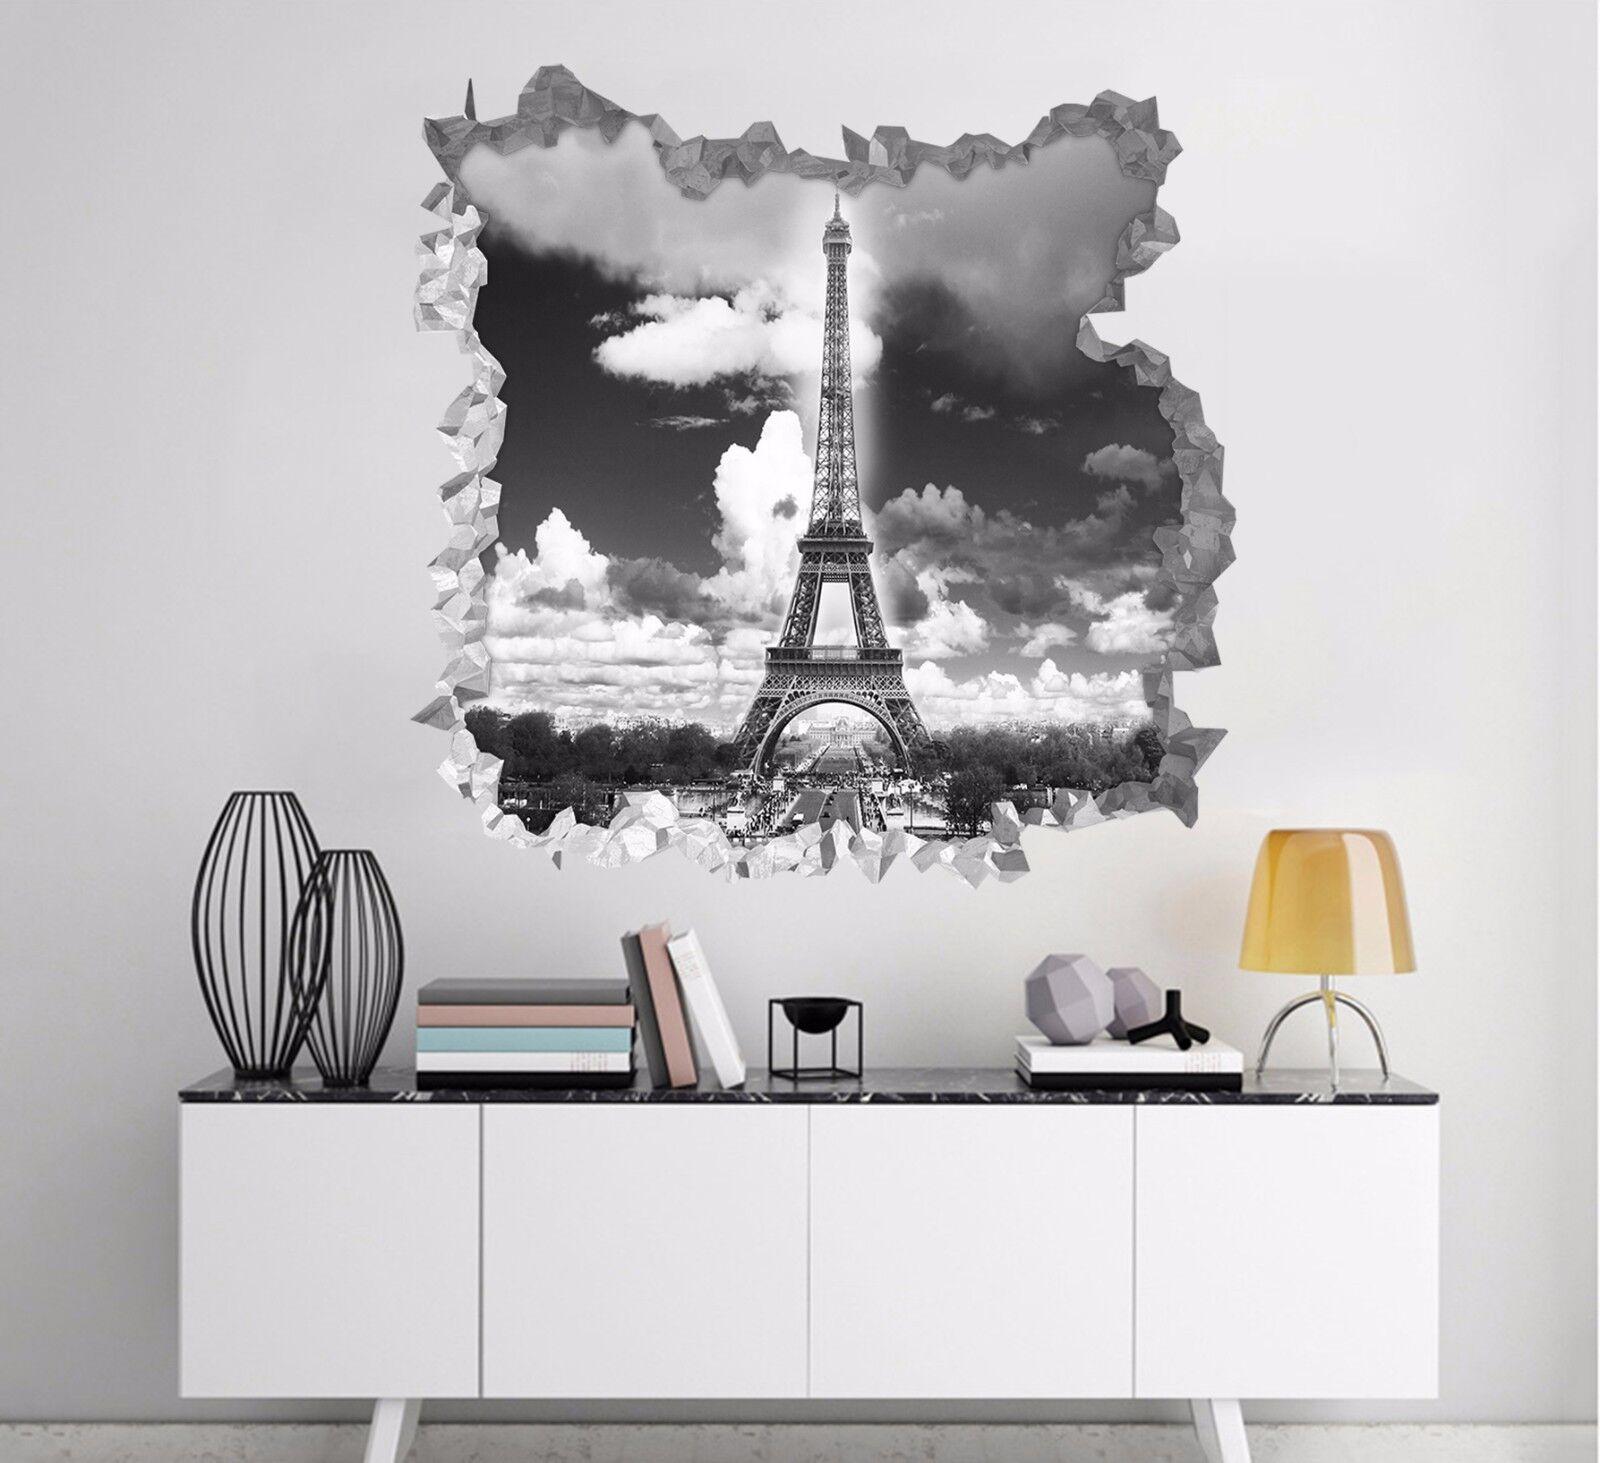 3D Torre Eiffel di Parigi 283 Parete Murales Parete Adesivi Decal Sfondamento IT